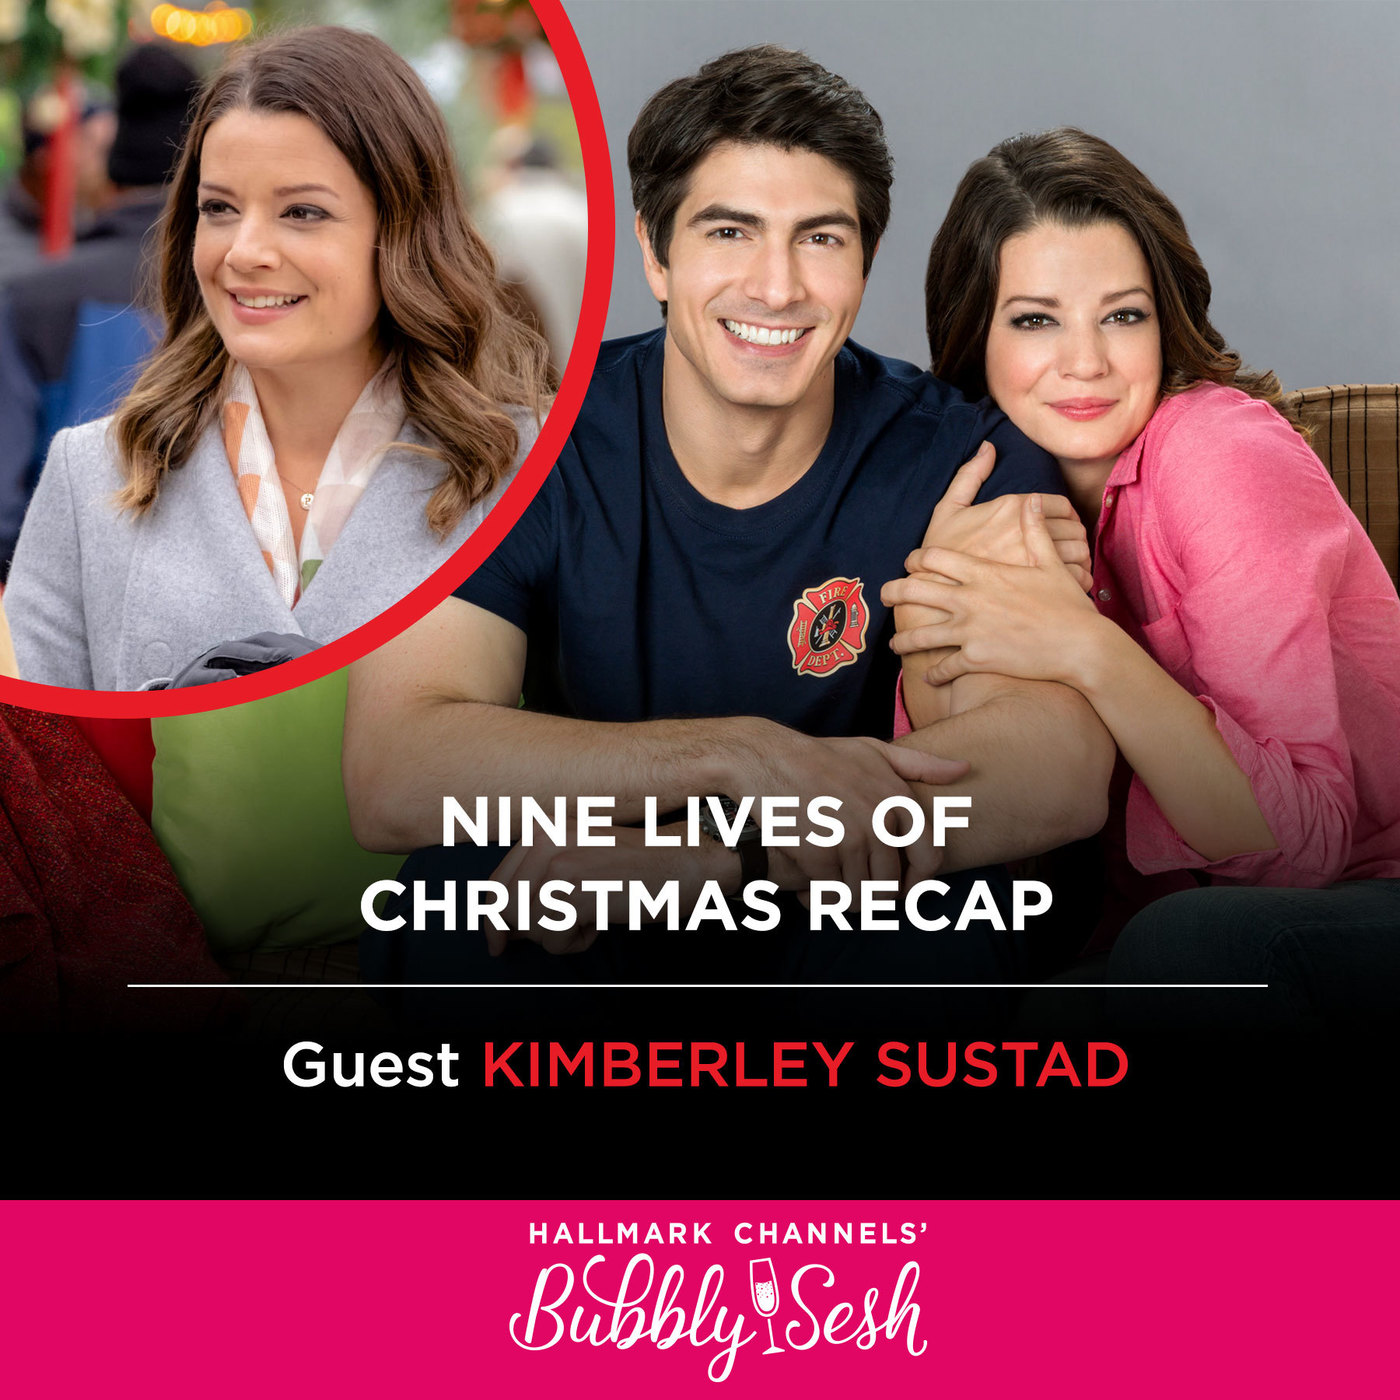 Nine Lives of Christmas Recap with Guest Kimberley Sustad